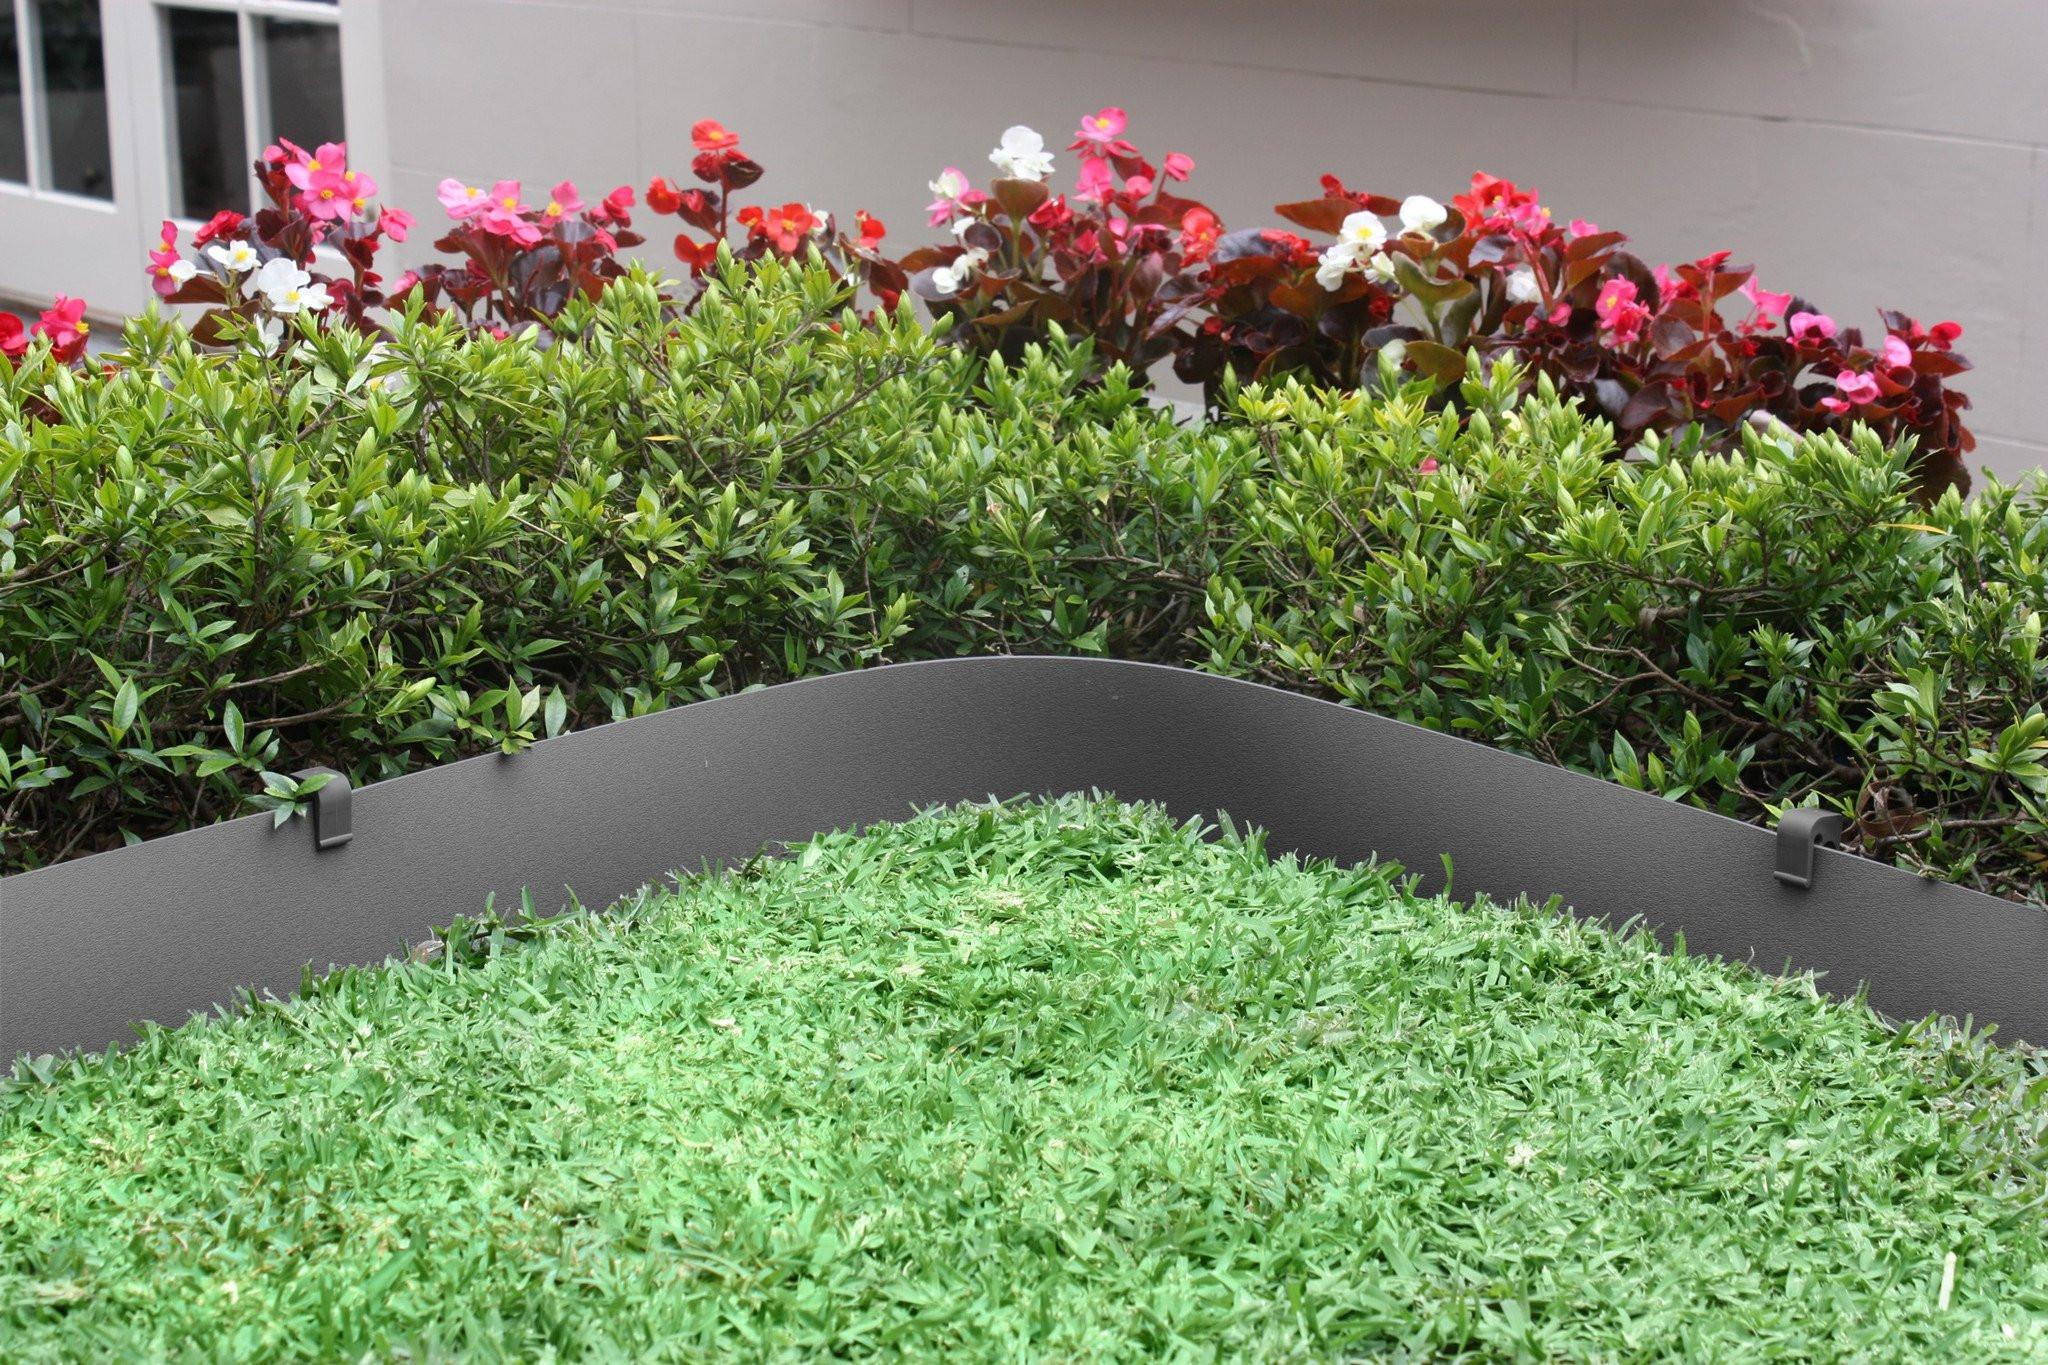 Plastic garden edging  13